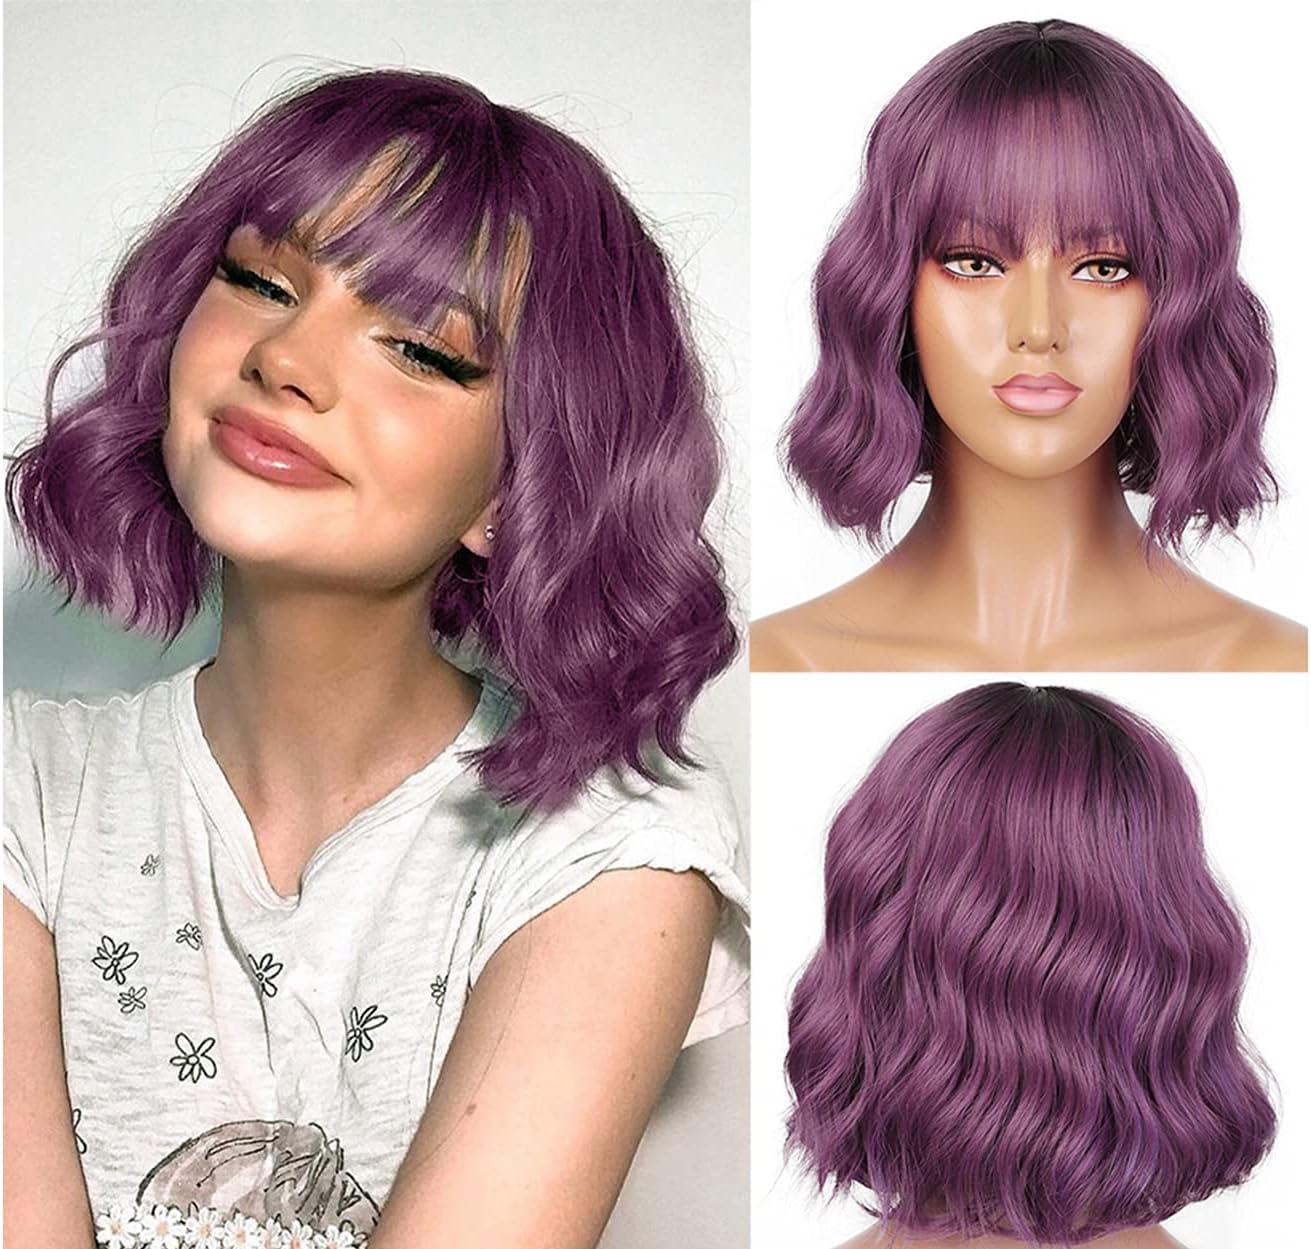 LEMEIZ Flawless Beachy Weave Purple Wigs with Bangs Ombre Dark to Purple Synthetic Wigs for Women Short Wob Hair Wigs uk 10 inch LEMEIZ-134